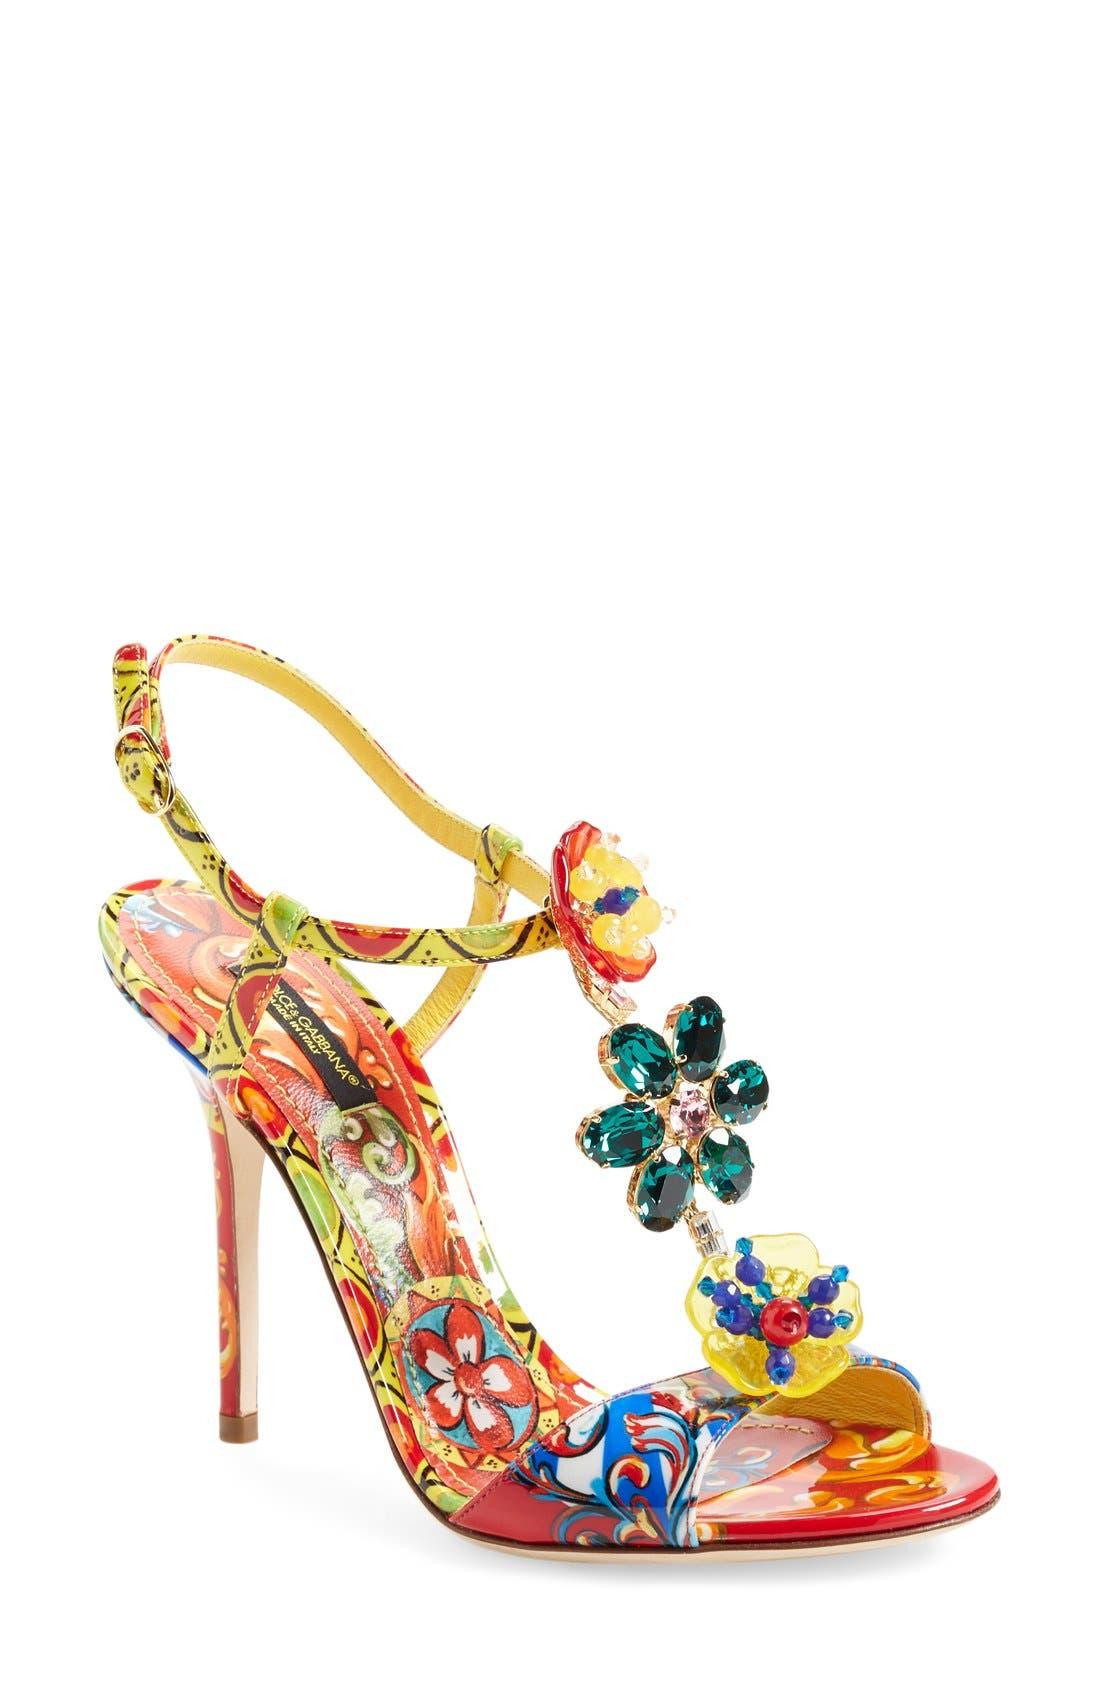 Main Image - Dolce&Gabbana Jeweled T-Strap Sandal (Women)